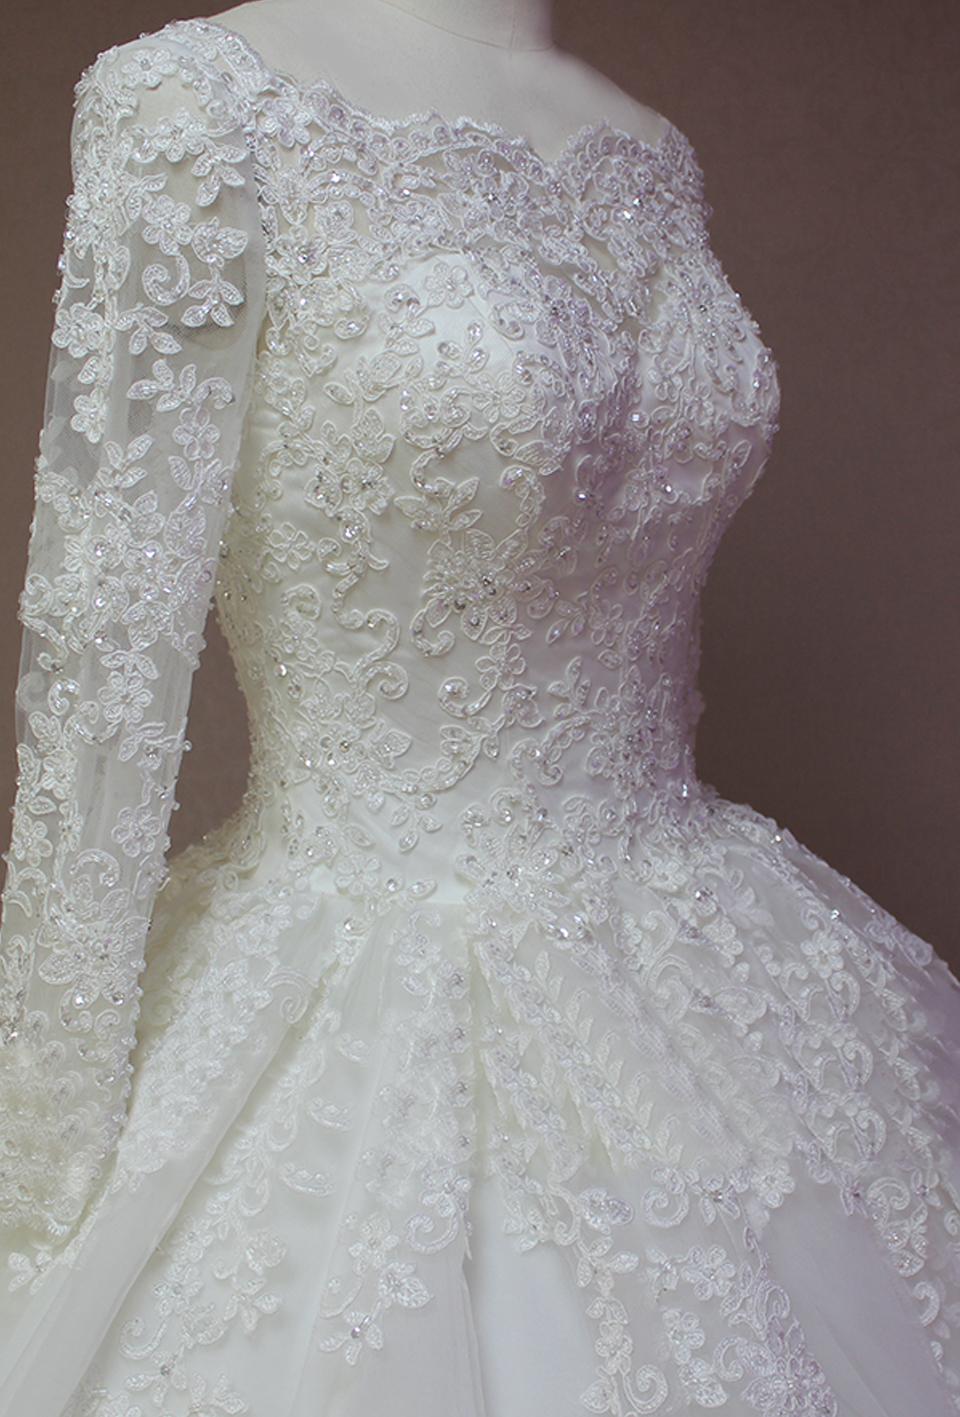 Free veil robe de mariage white ivory us2 4 6 for Long veils for wedding dresses